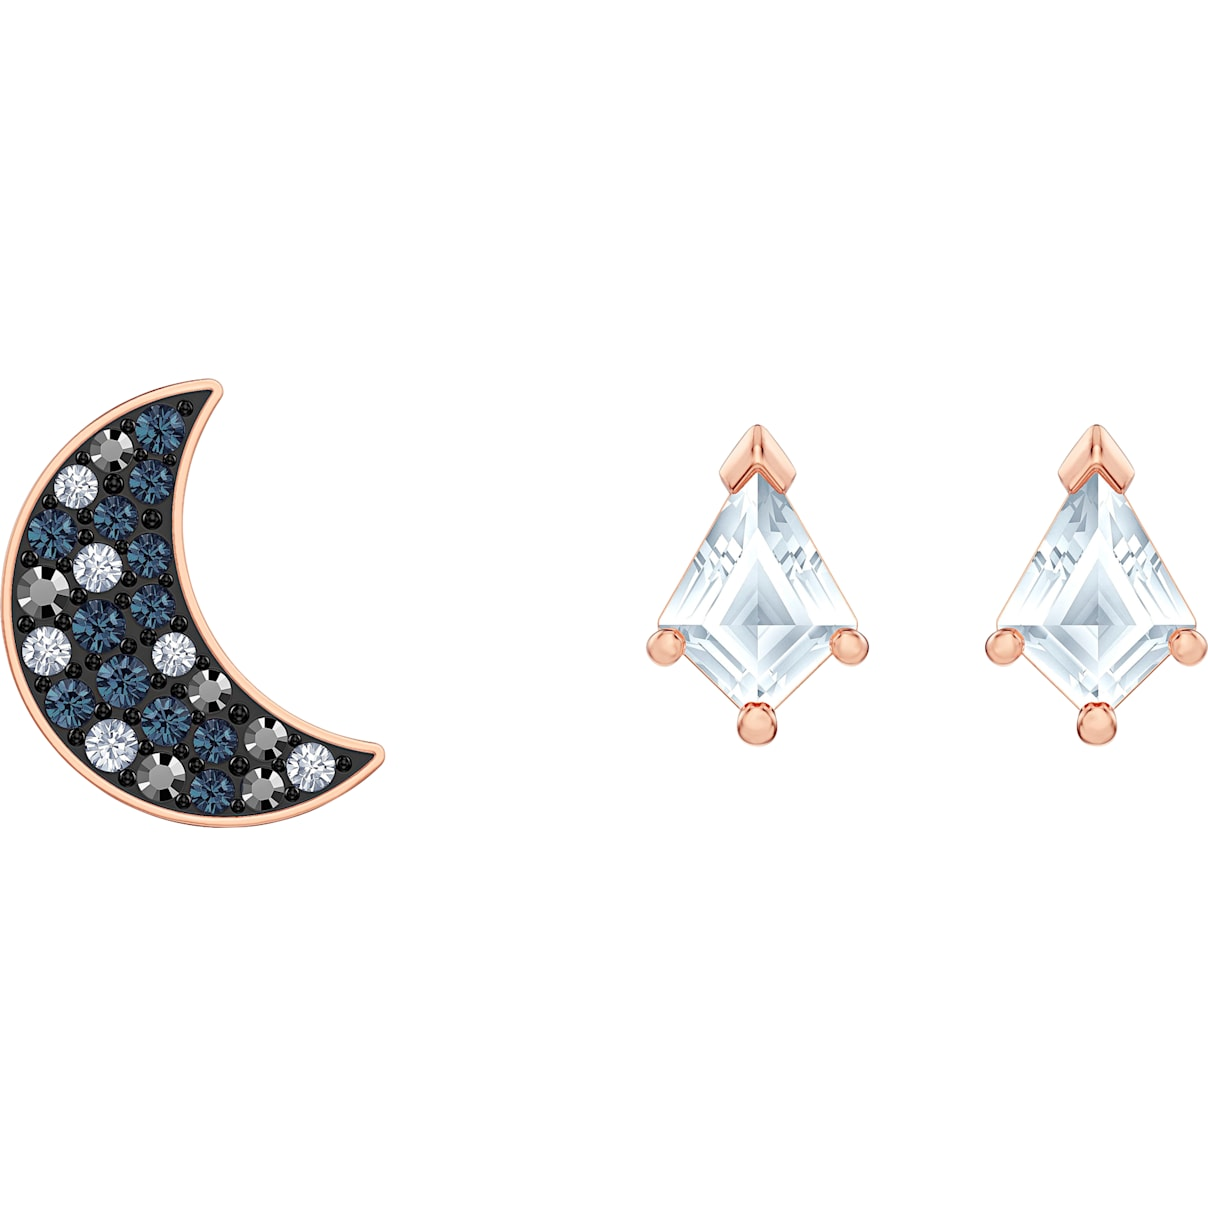 Swarovski Swarovski Symbolic Pierced Earrings set, Multi-colored, Rose-gold tone plated